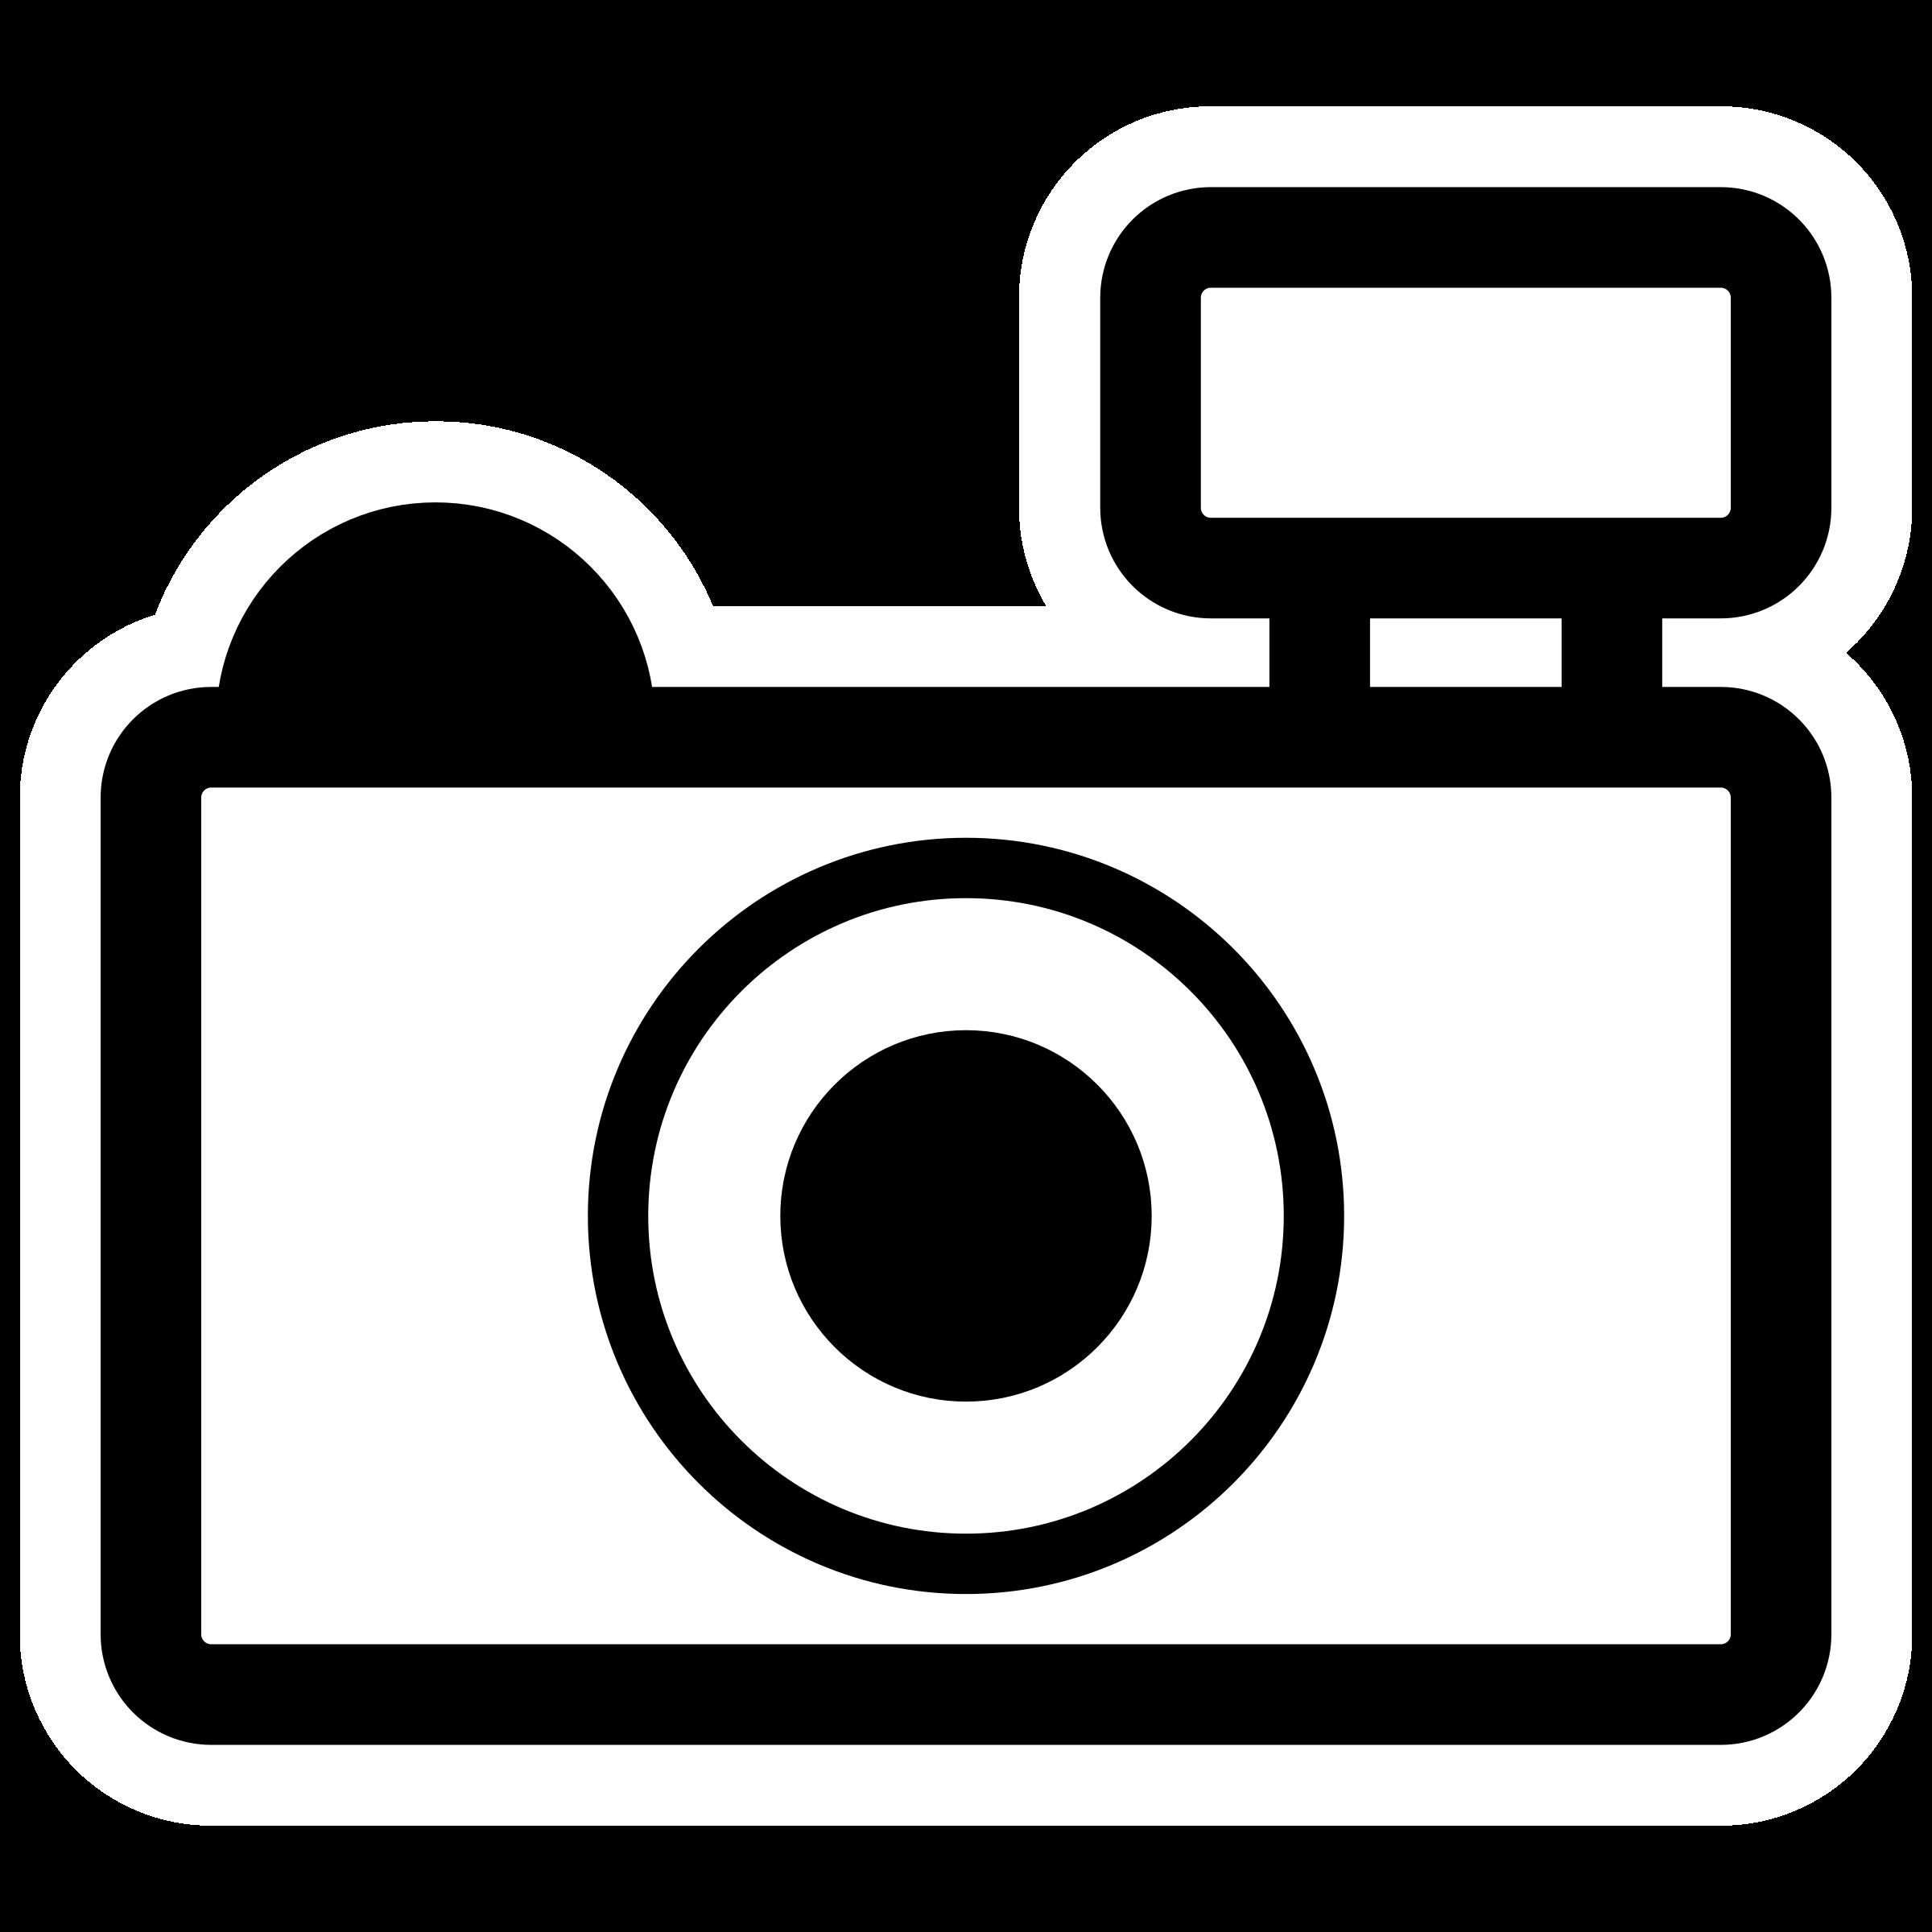 Camera clipart #10, Download drawings